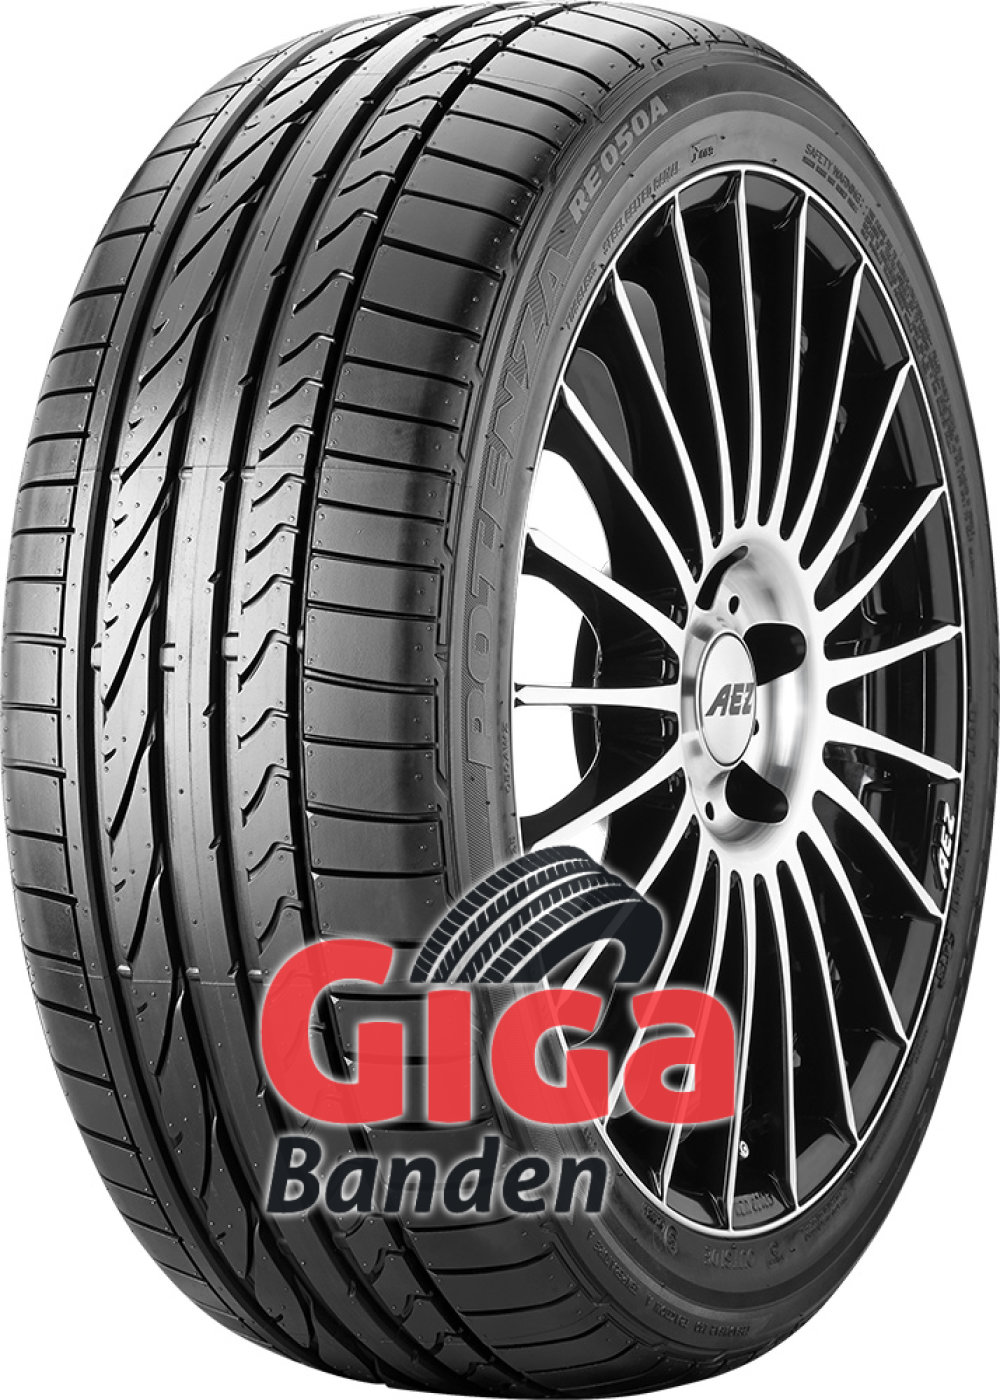 Bridgestone Potenza RE 050 A ( 225/45 R18 91V met velgrandbescherming (MFS) )